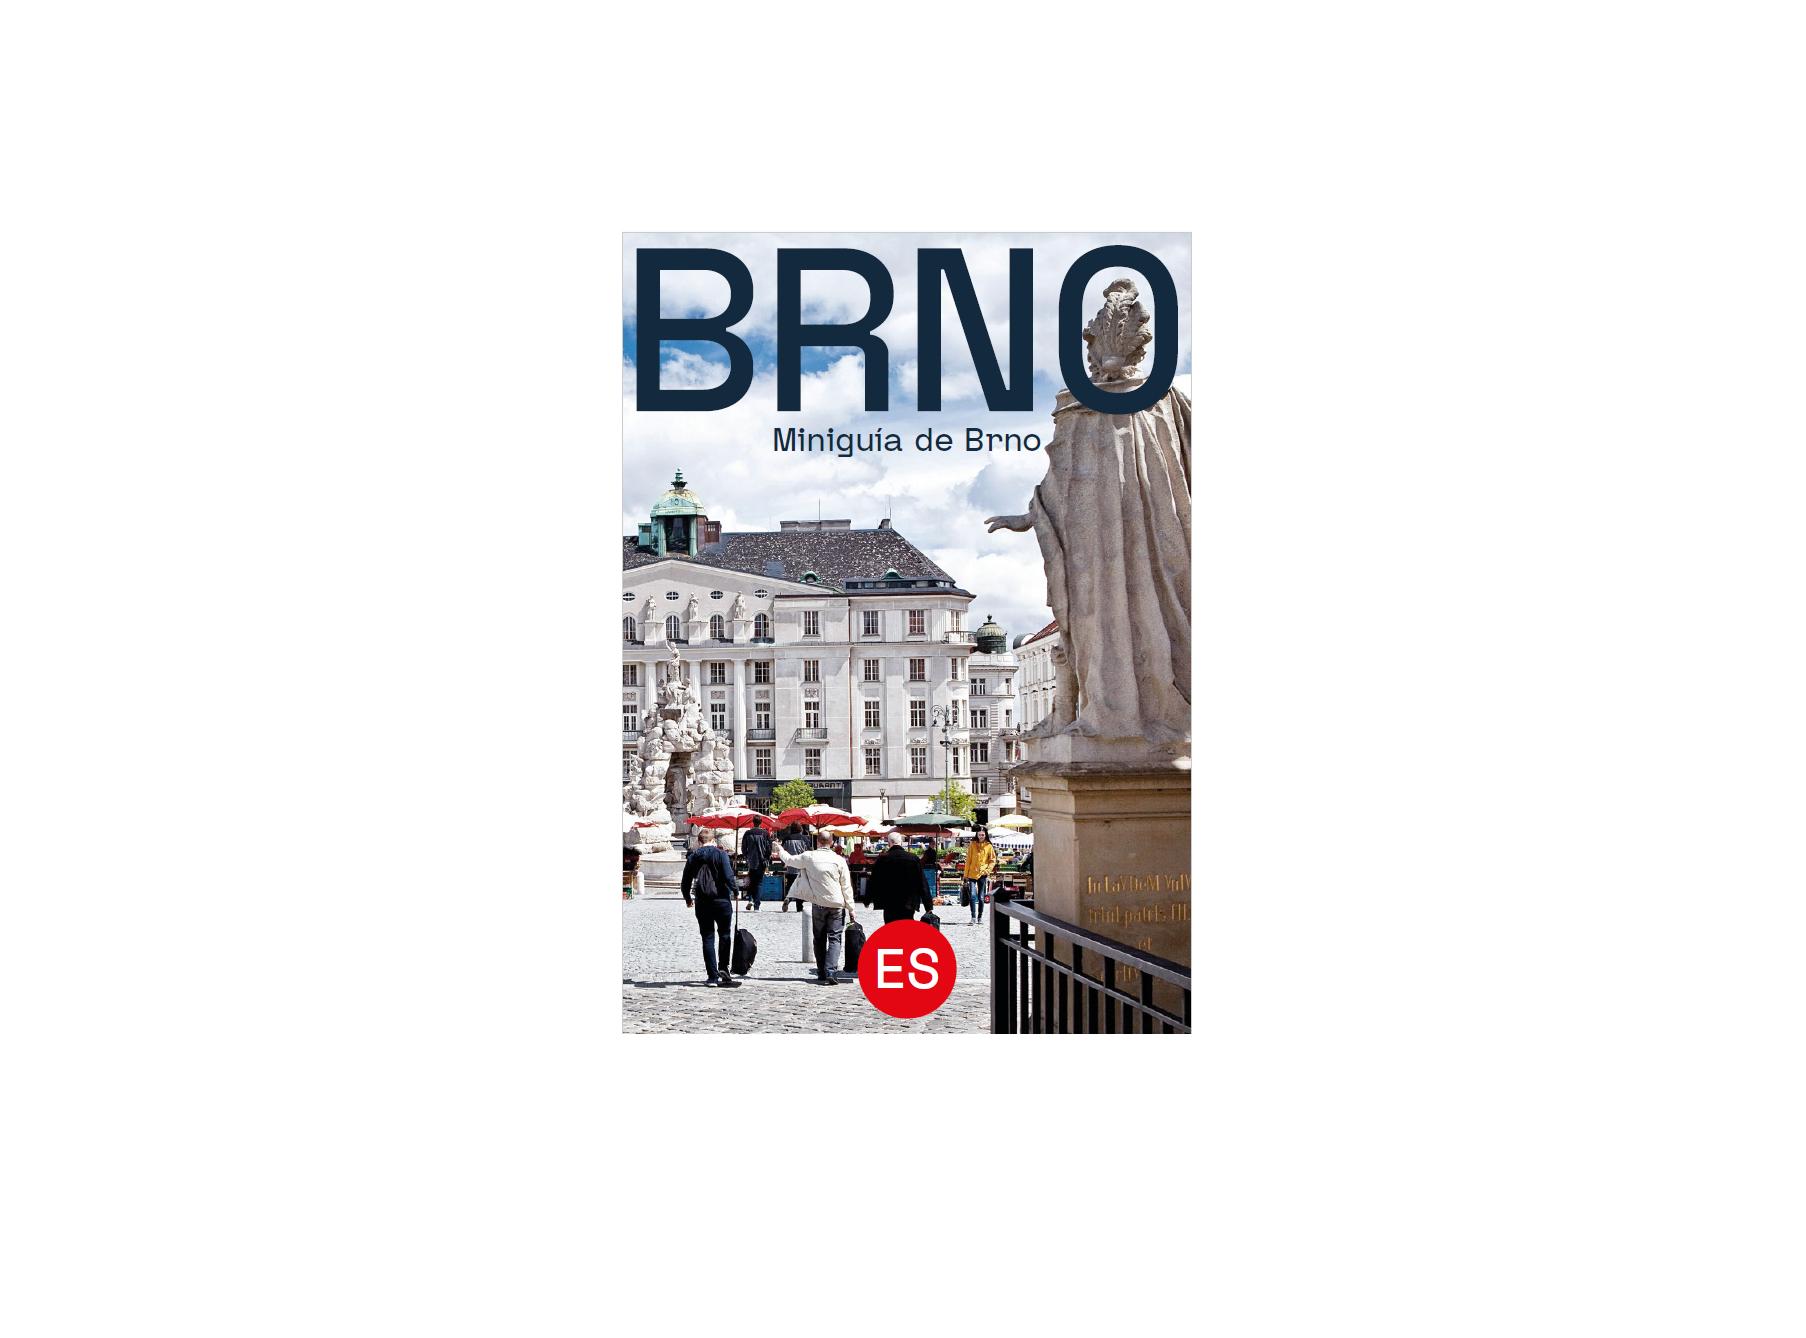 Miniguía de Brno